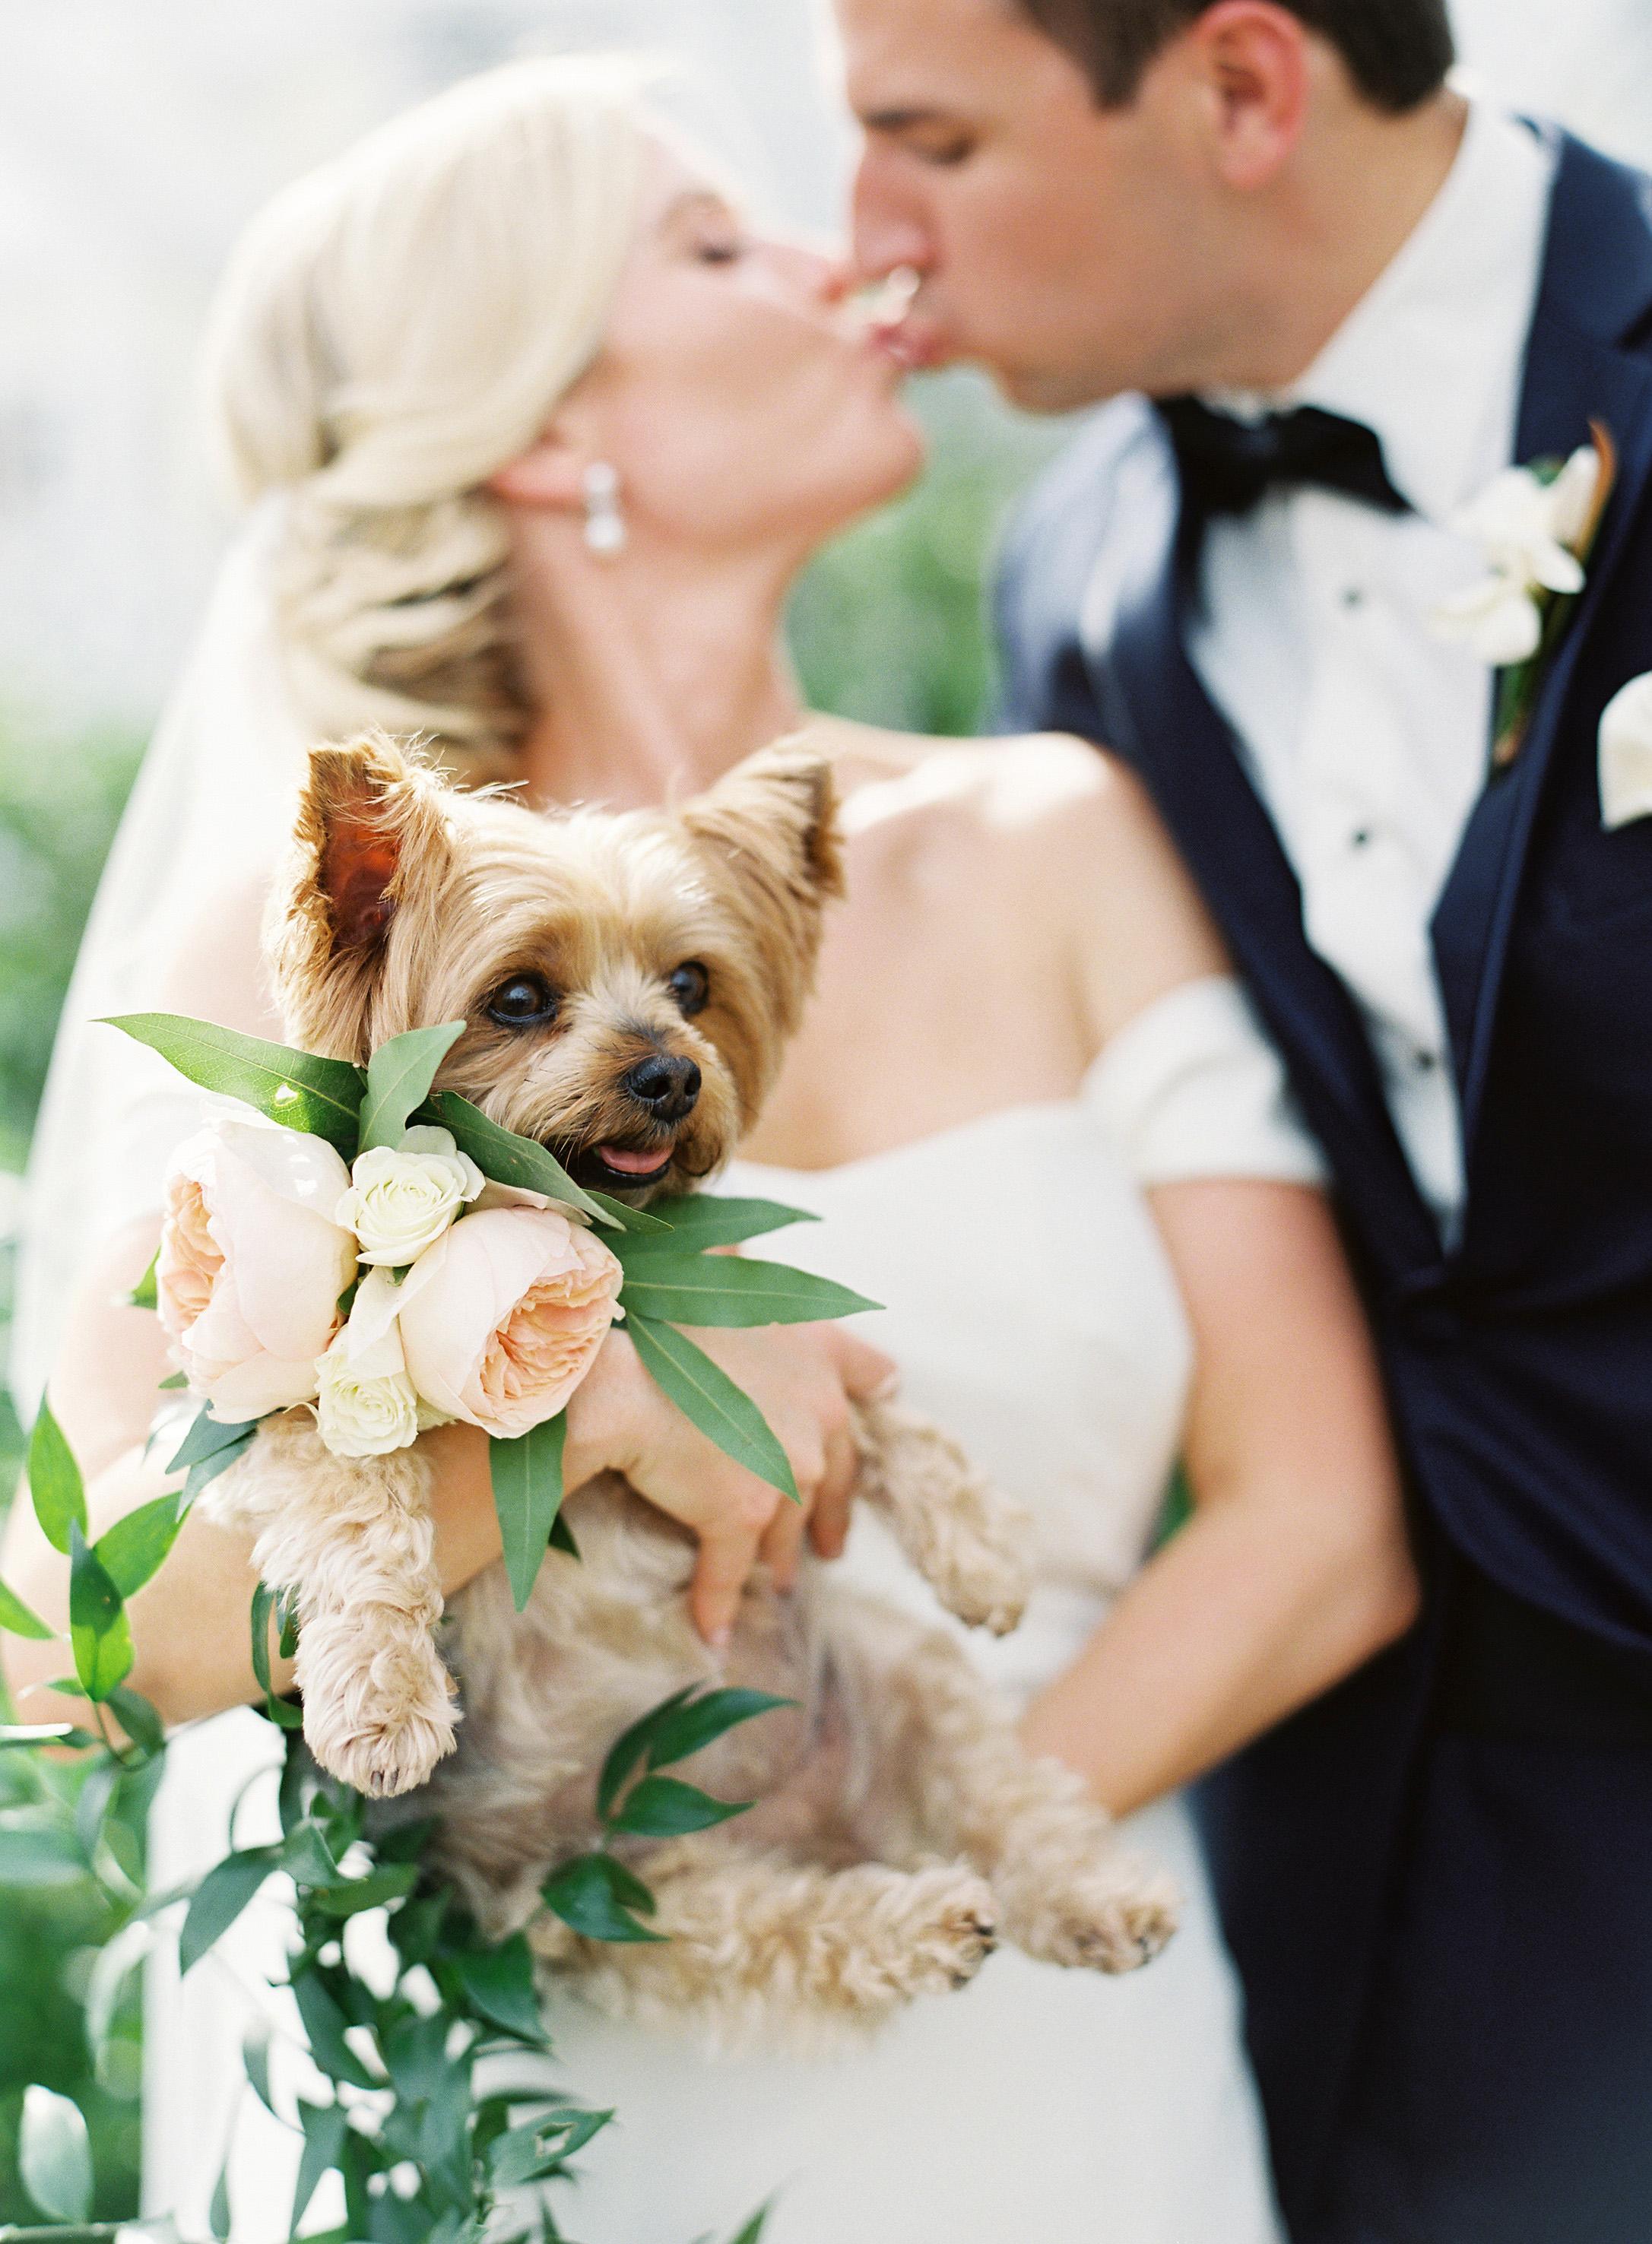 dog wedding bride groom kiss couple puppy bouquet